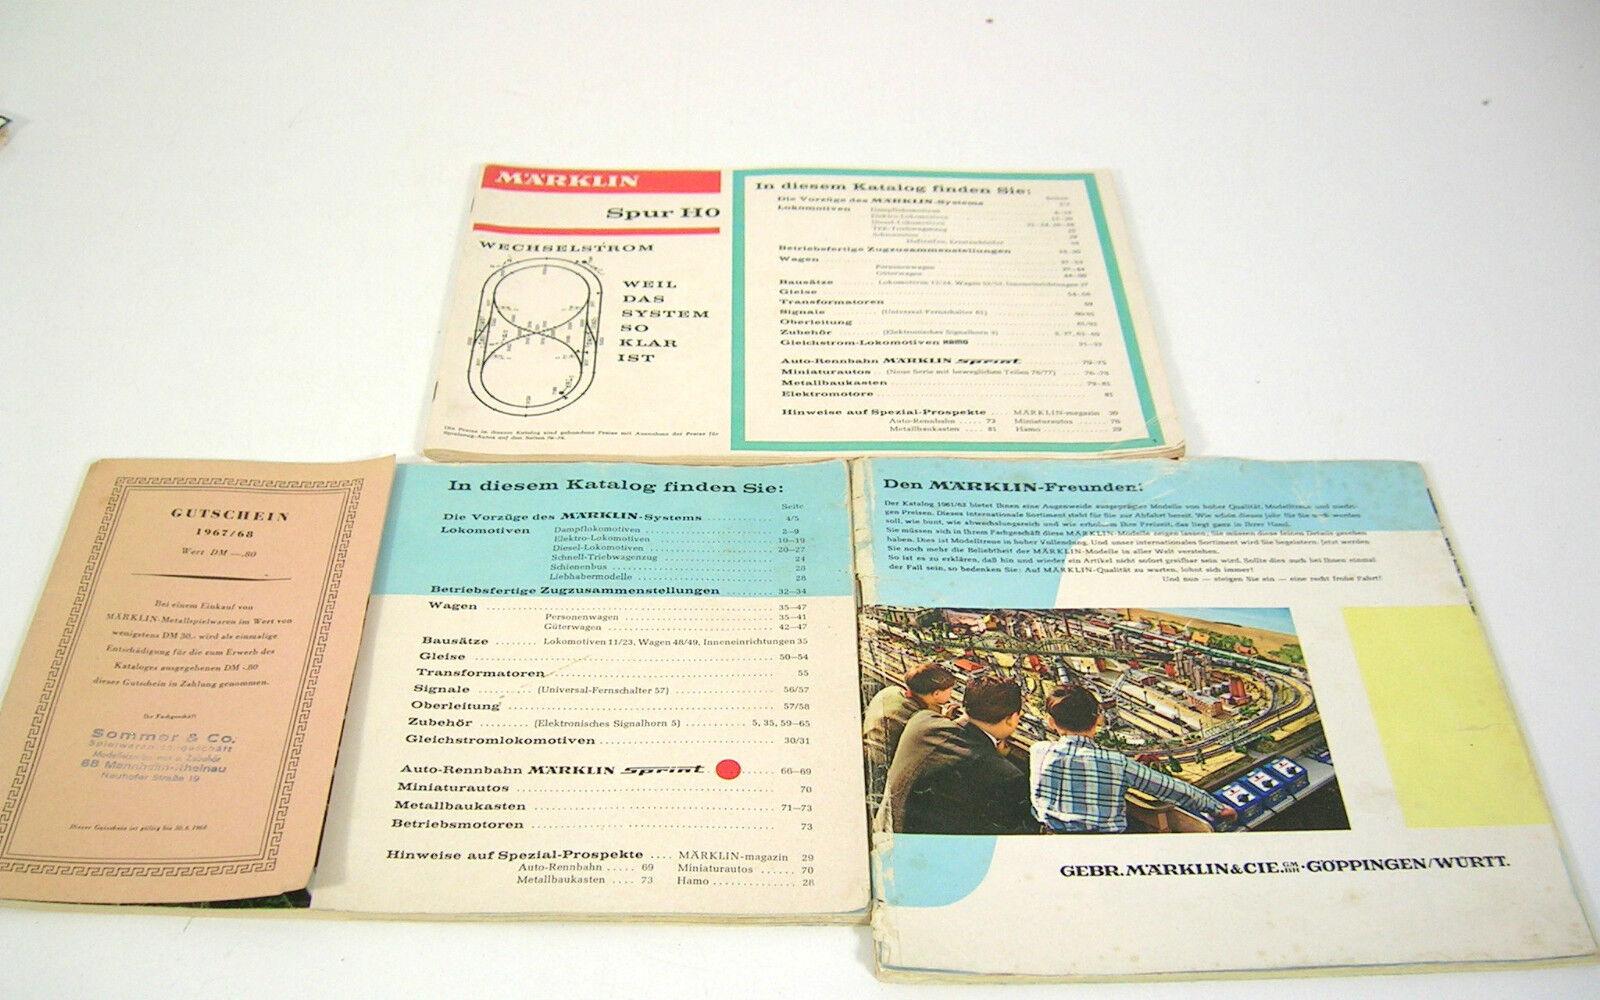 h0 00 3 cataloghi 1961/62 1967/68 1968/69 800